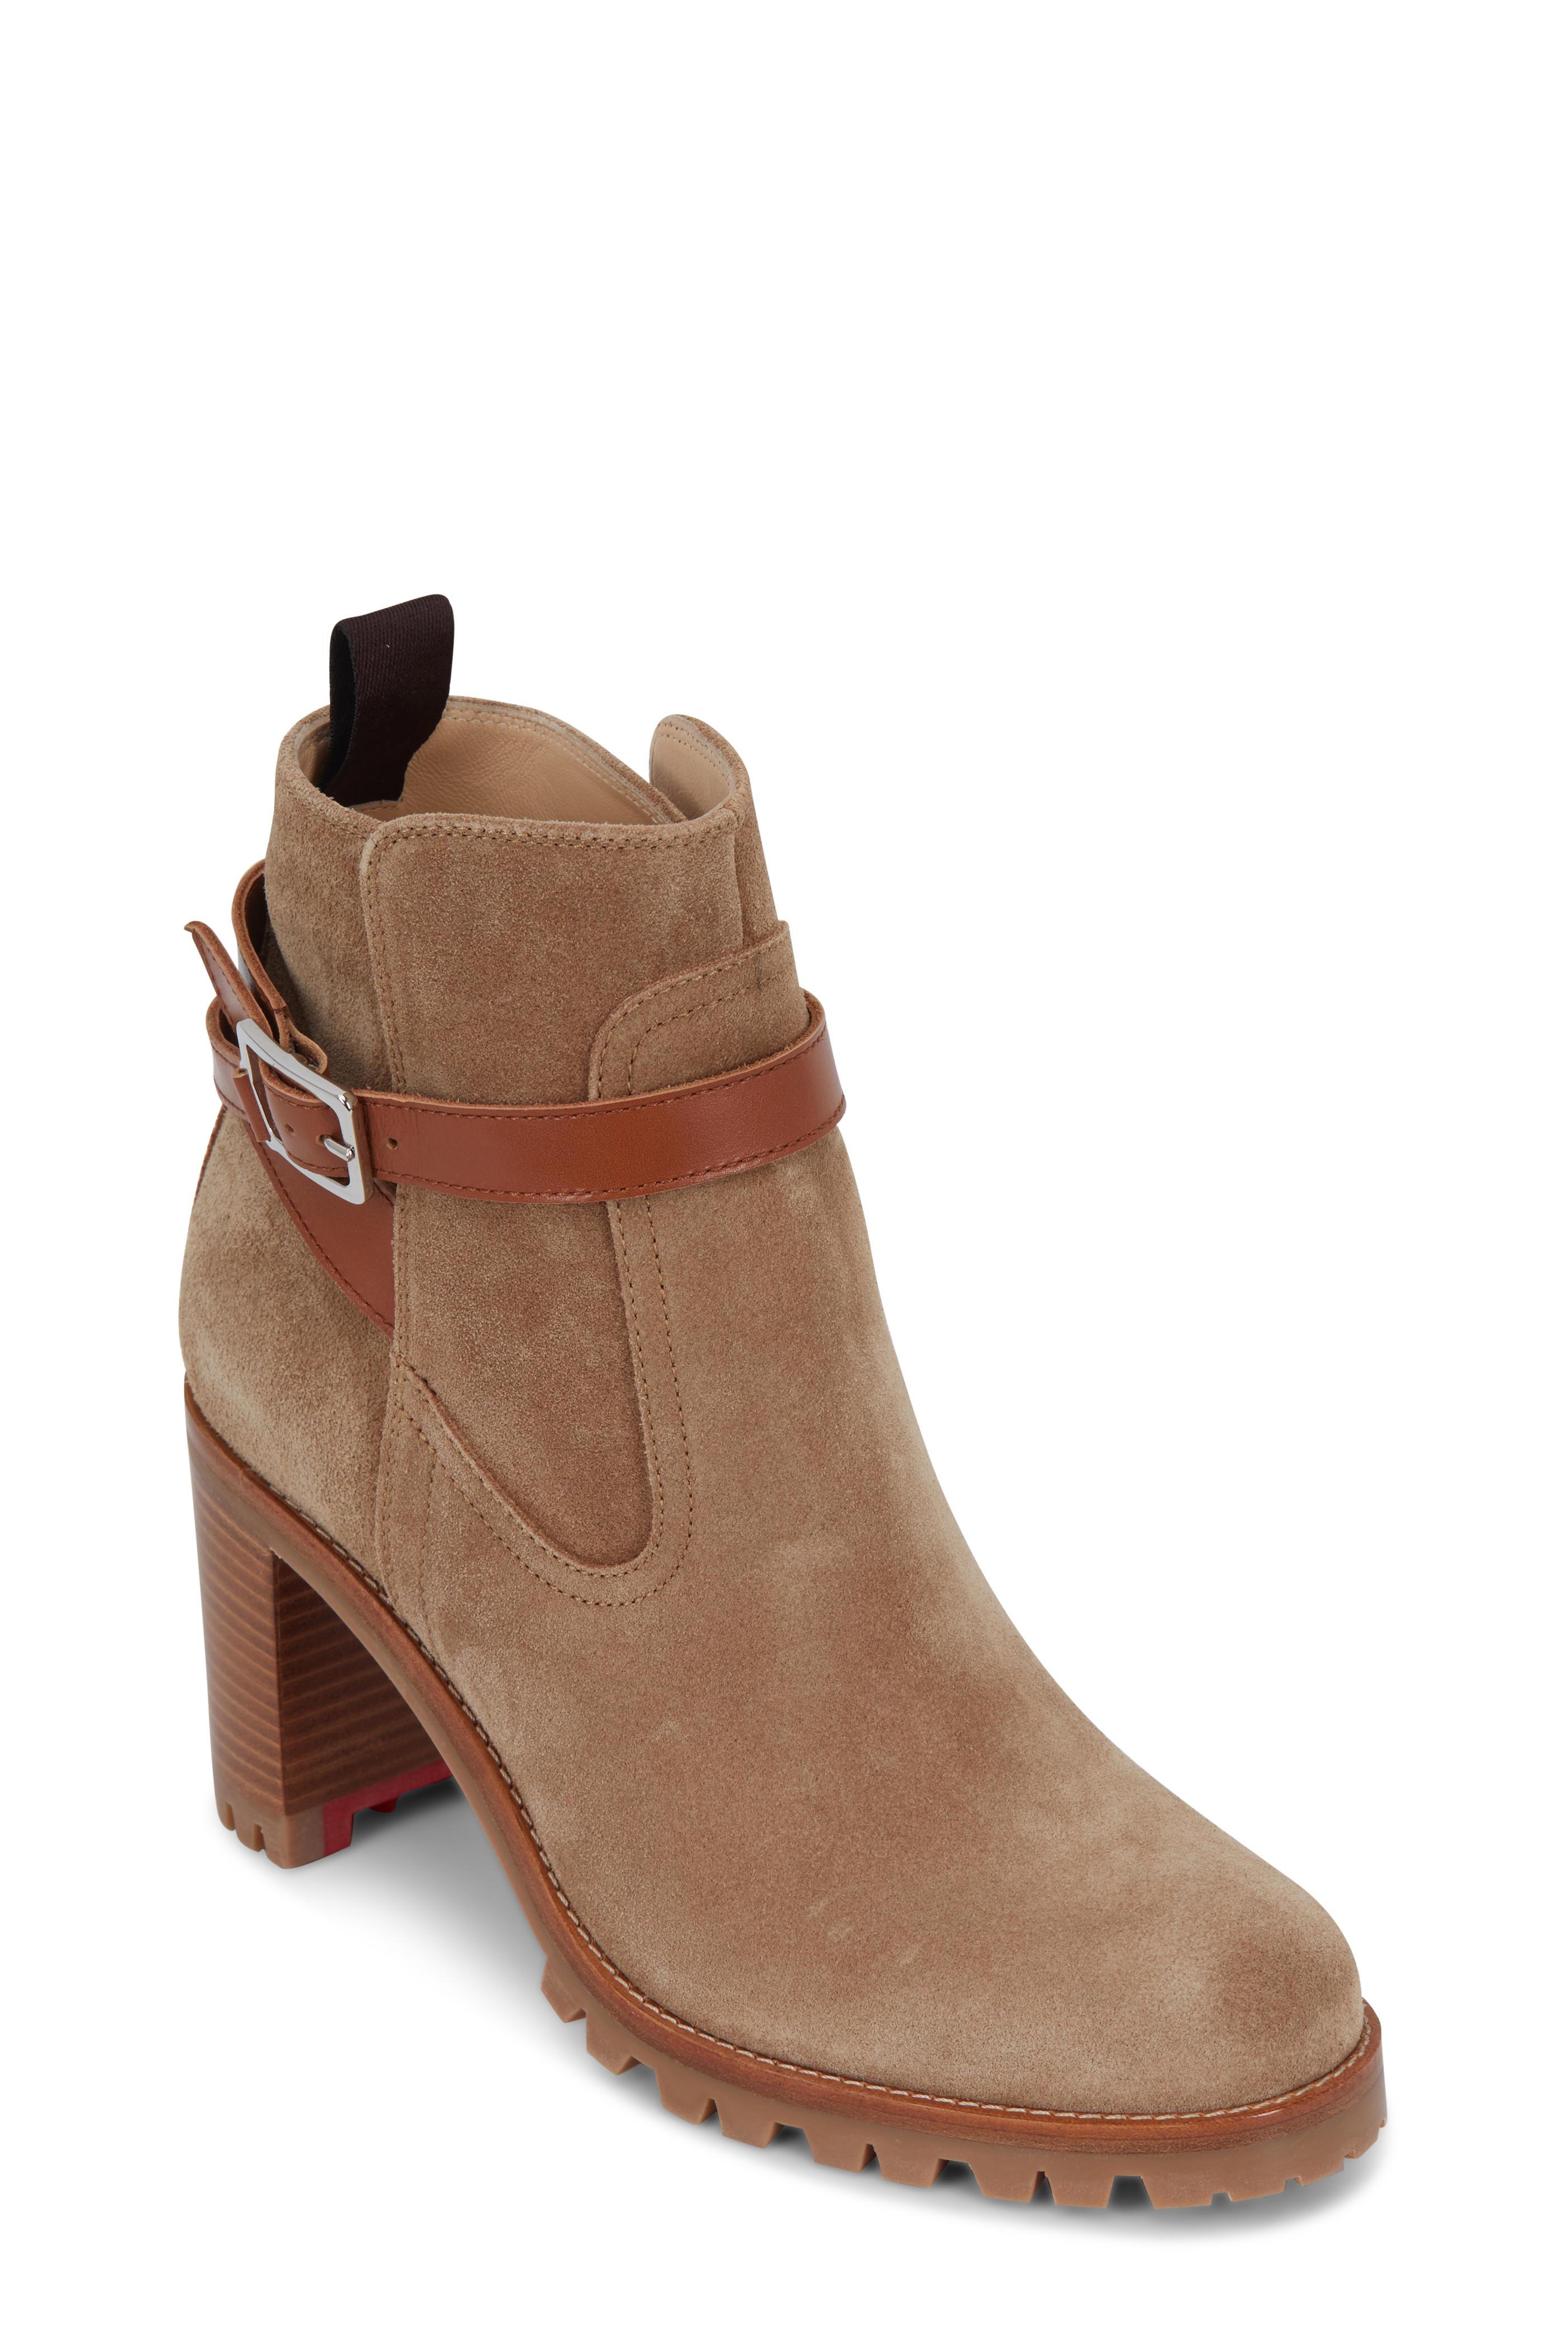 timeless design b3baa 5a8a4 Christian Louboutin - Trapeurdekoi Tan Suede Ankle Boot ...